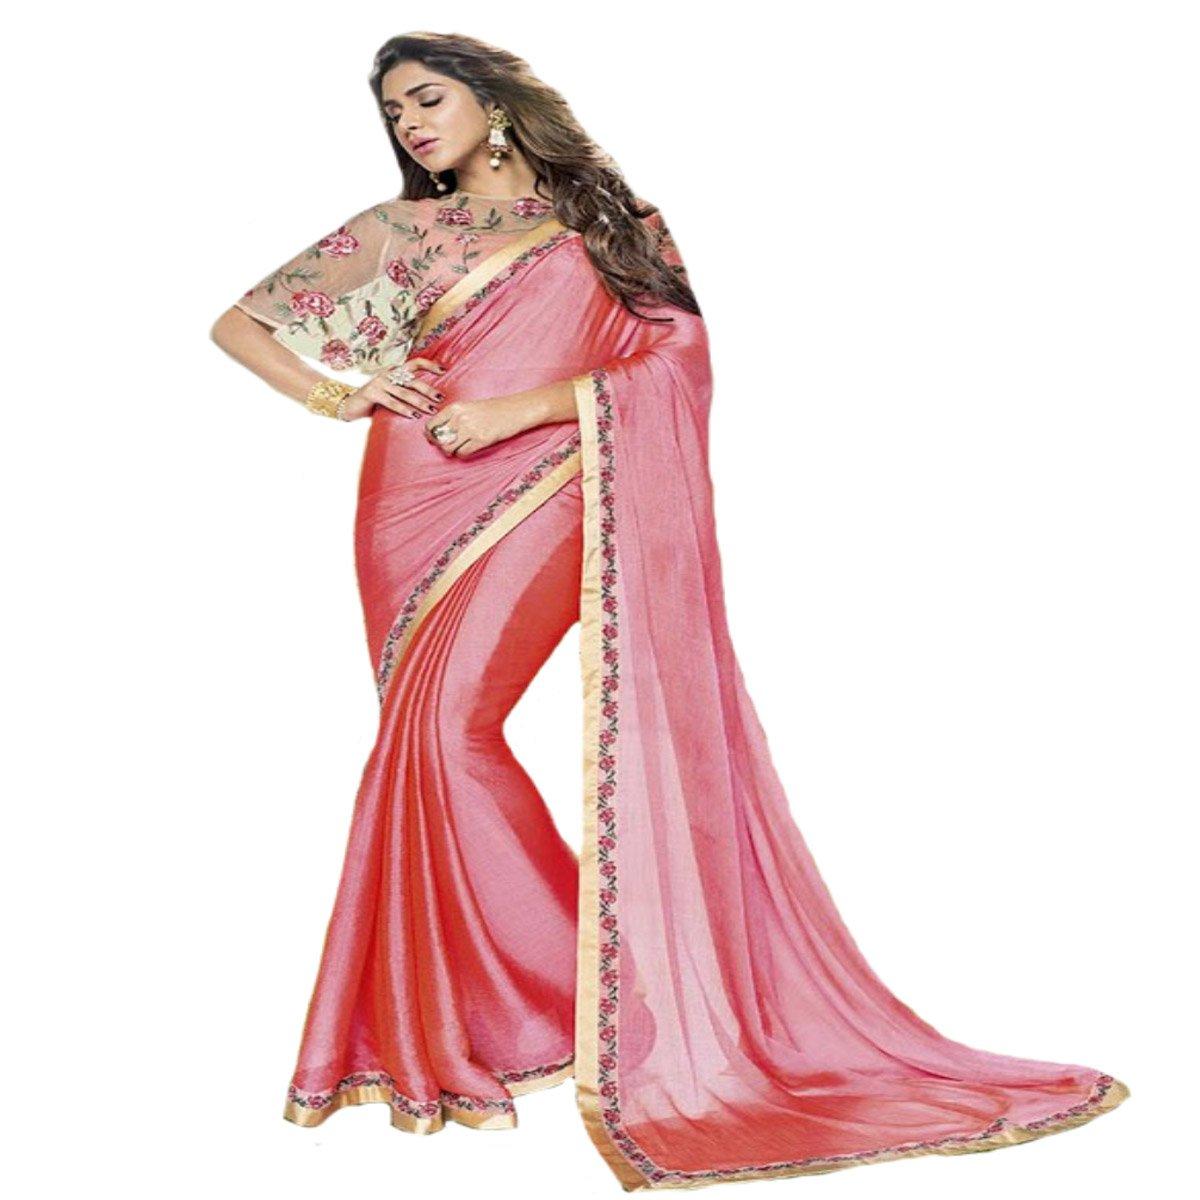 Indio Diwali boda ceremonia Party Wear Sari Mujeres saree funda ...